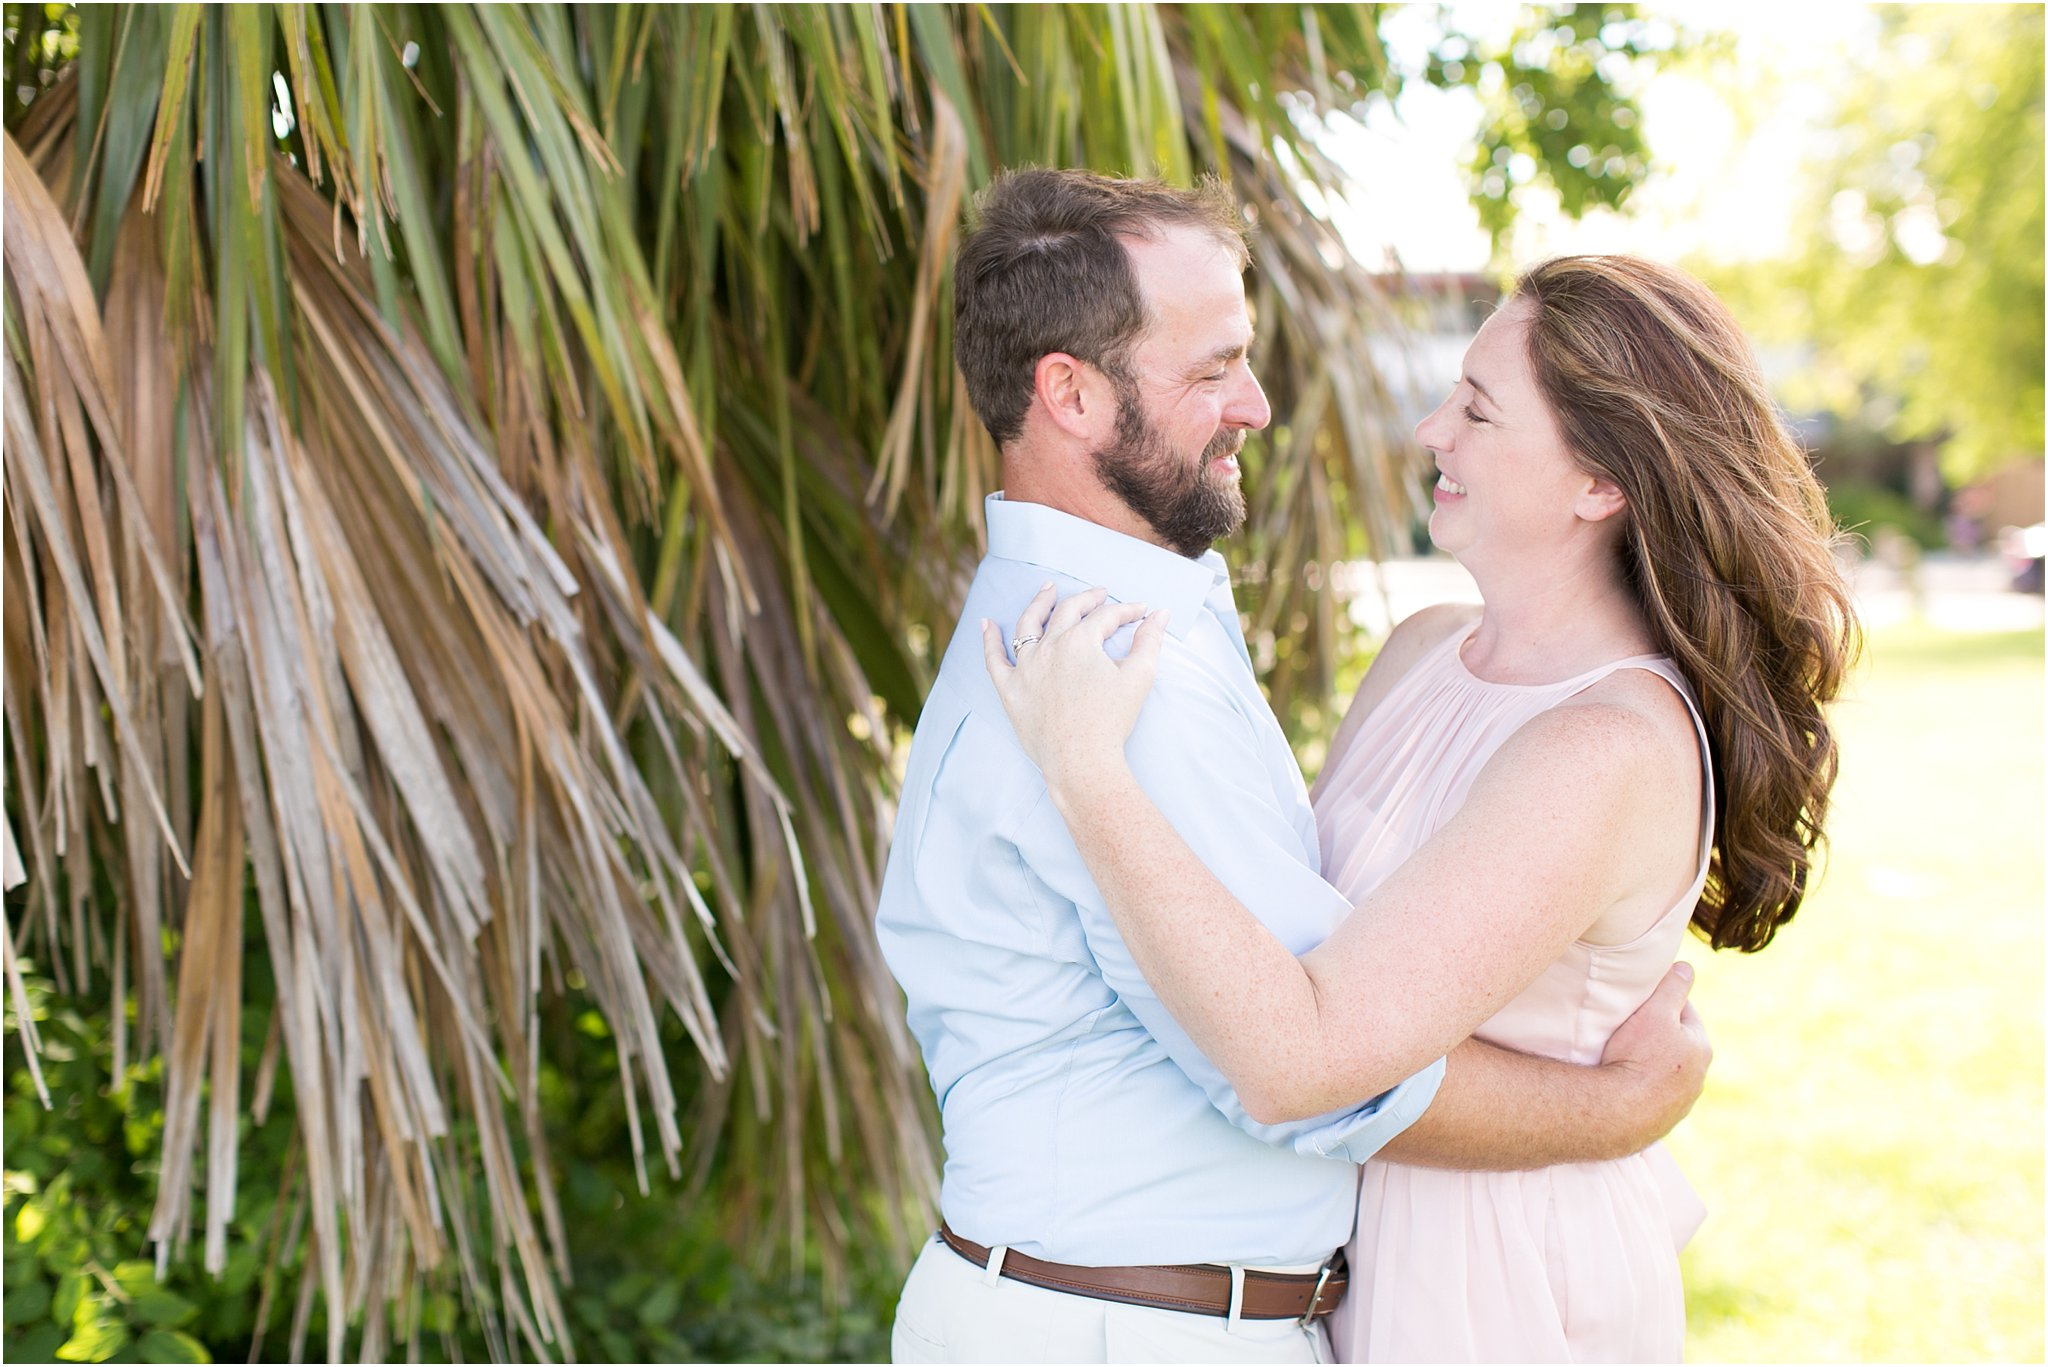 jessica_ryan_photography_wedding_photographs_virginia_fernandina_beach_florida_wedding_2122